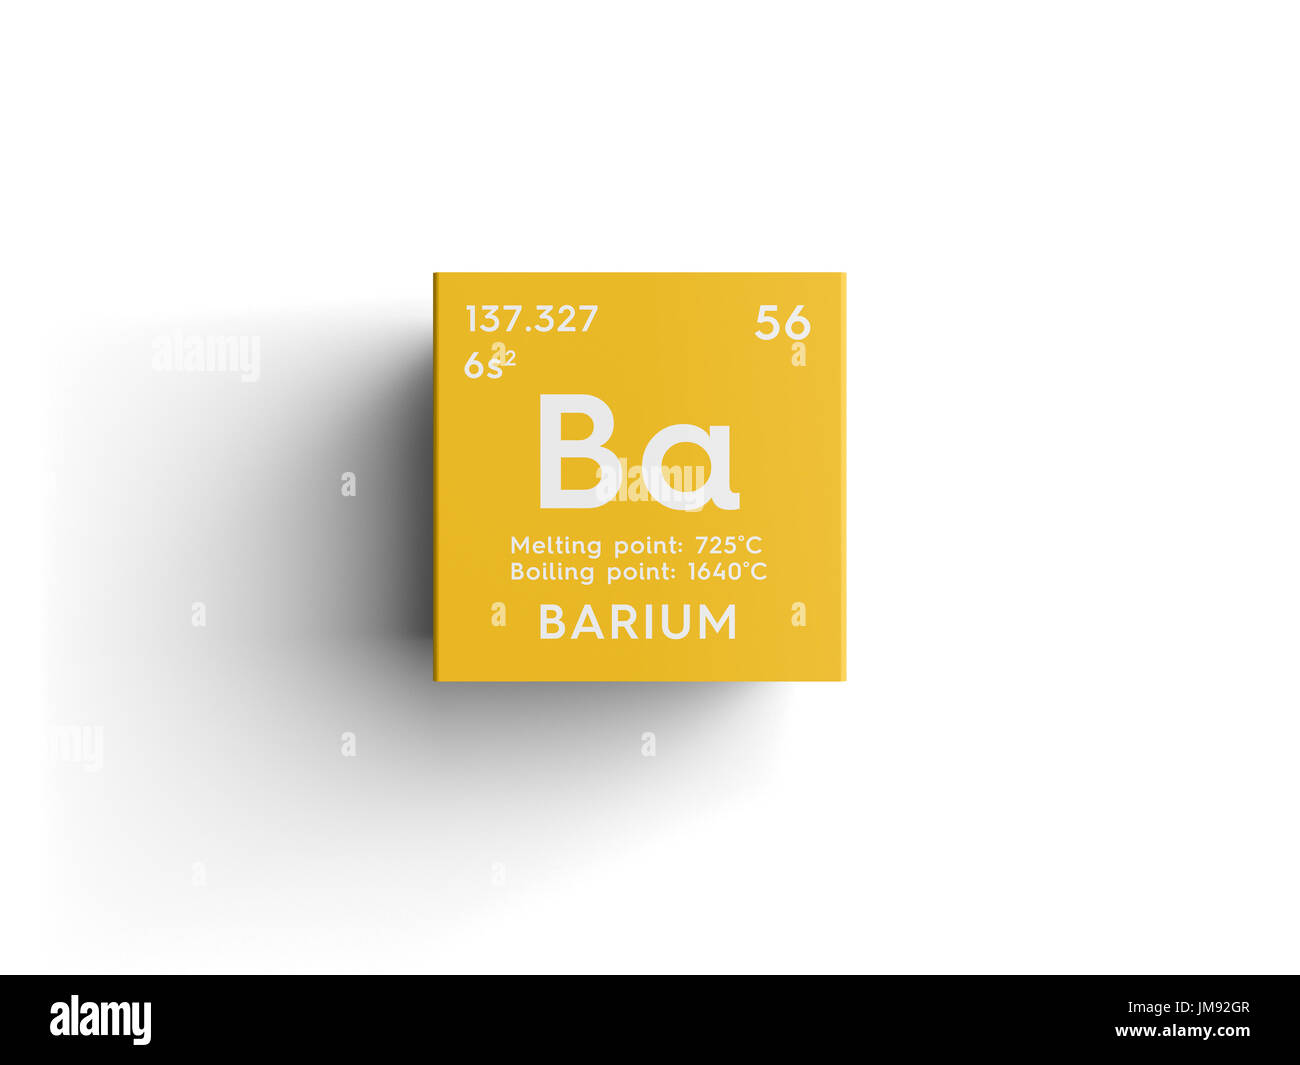 Barium alkaline earth metals chemical element of mendeleevs barium alkaline earth metals chemical element of mendeleevs periodic table barium in square cube creative concept biocorpaavc Images